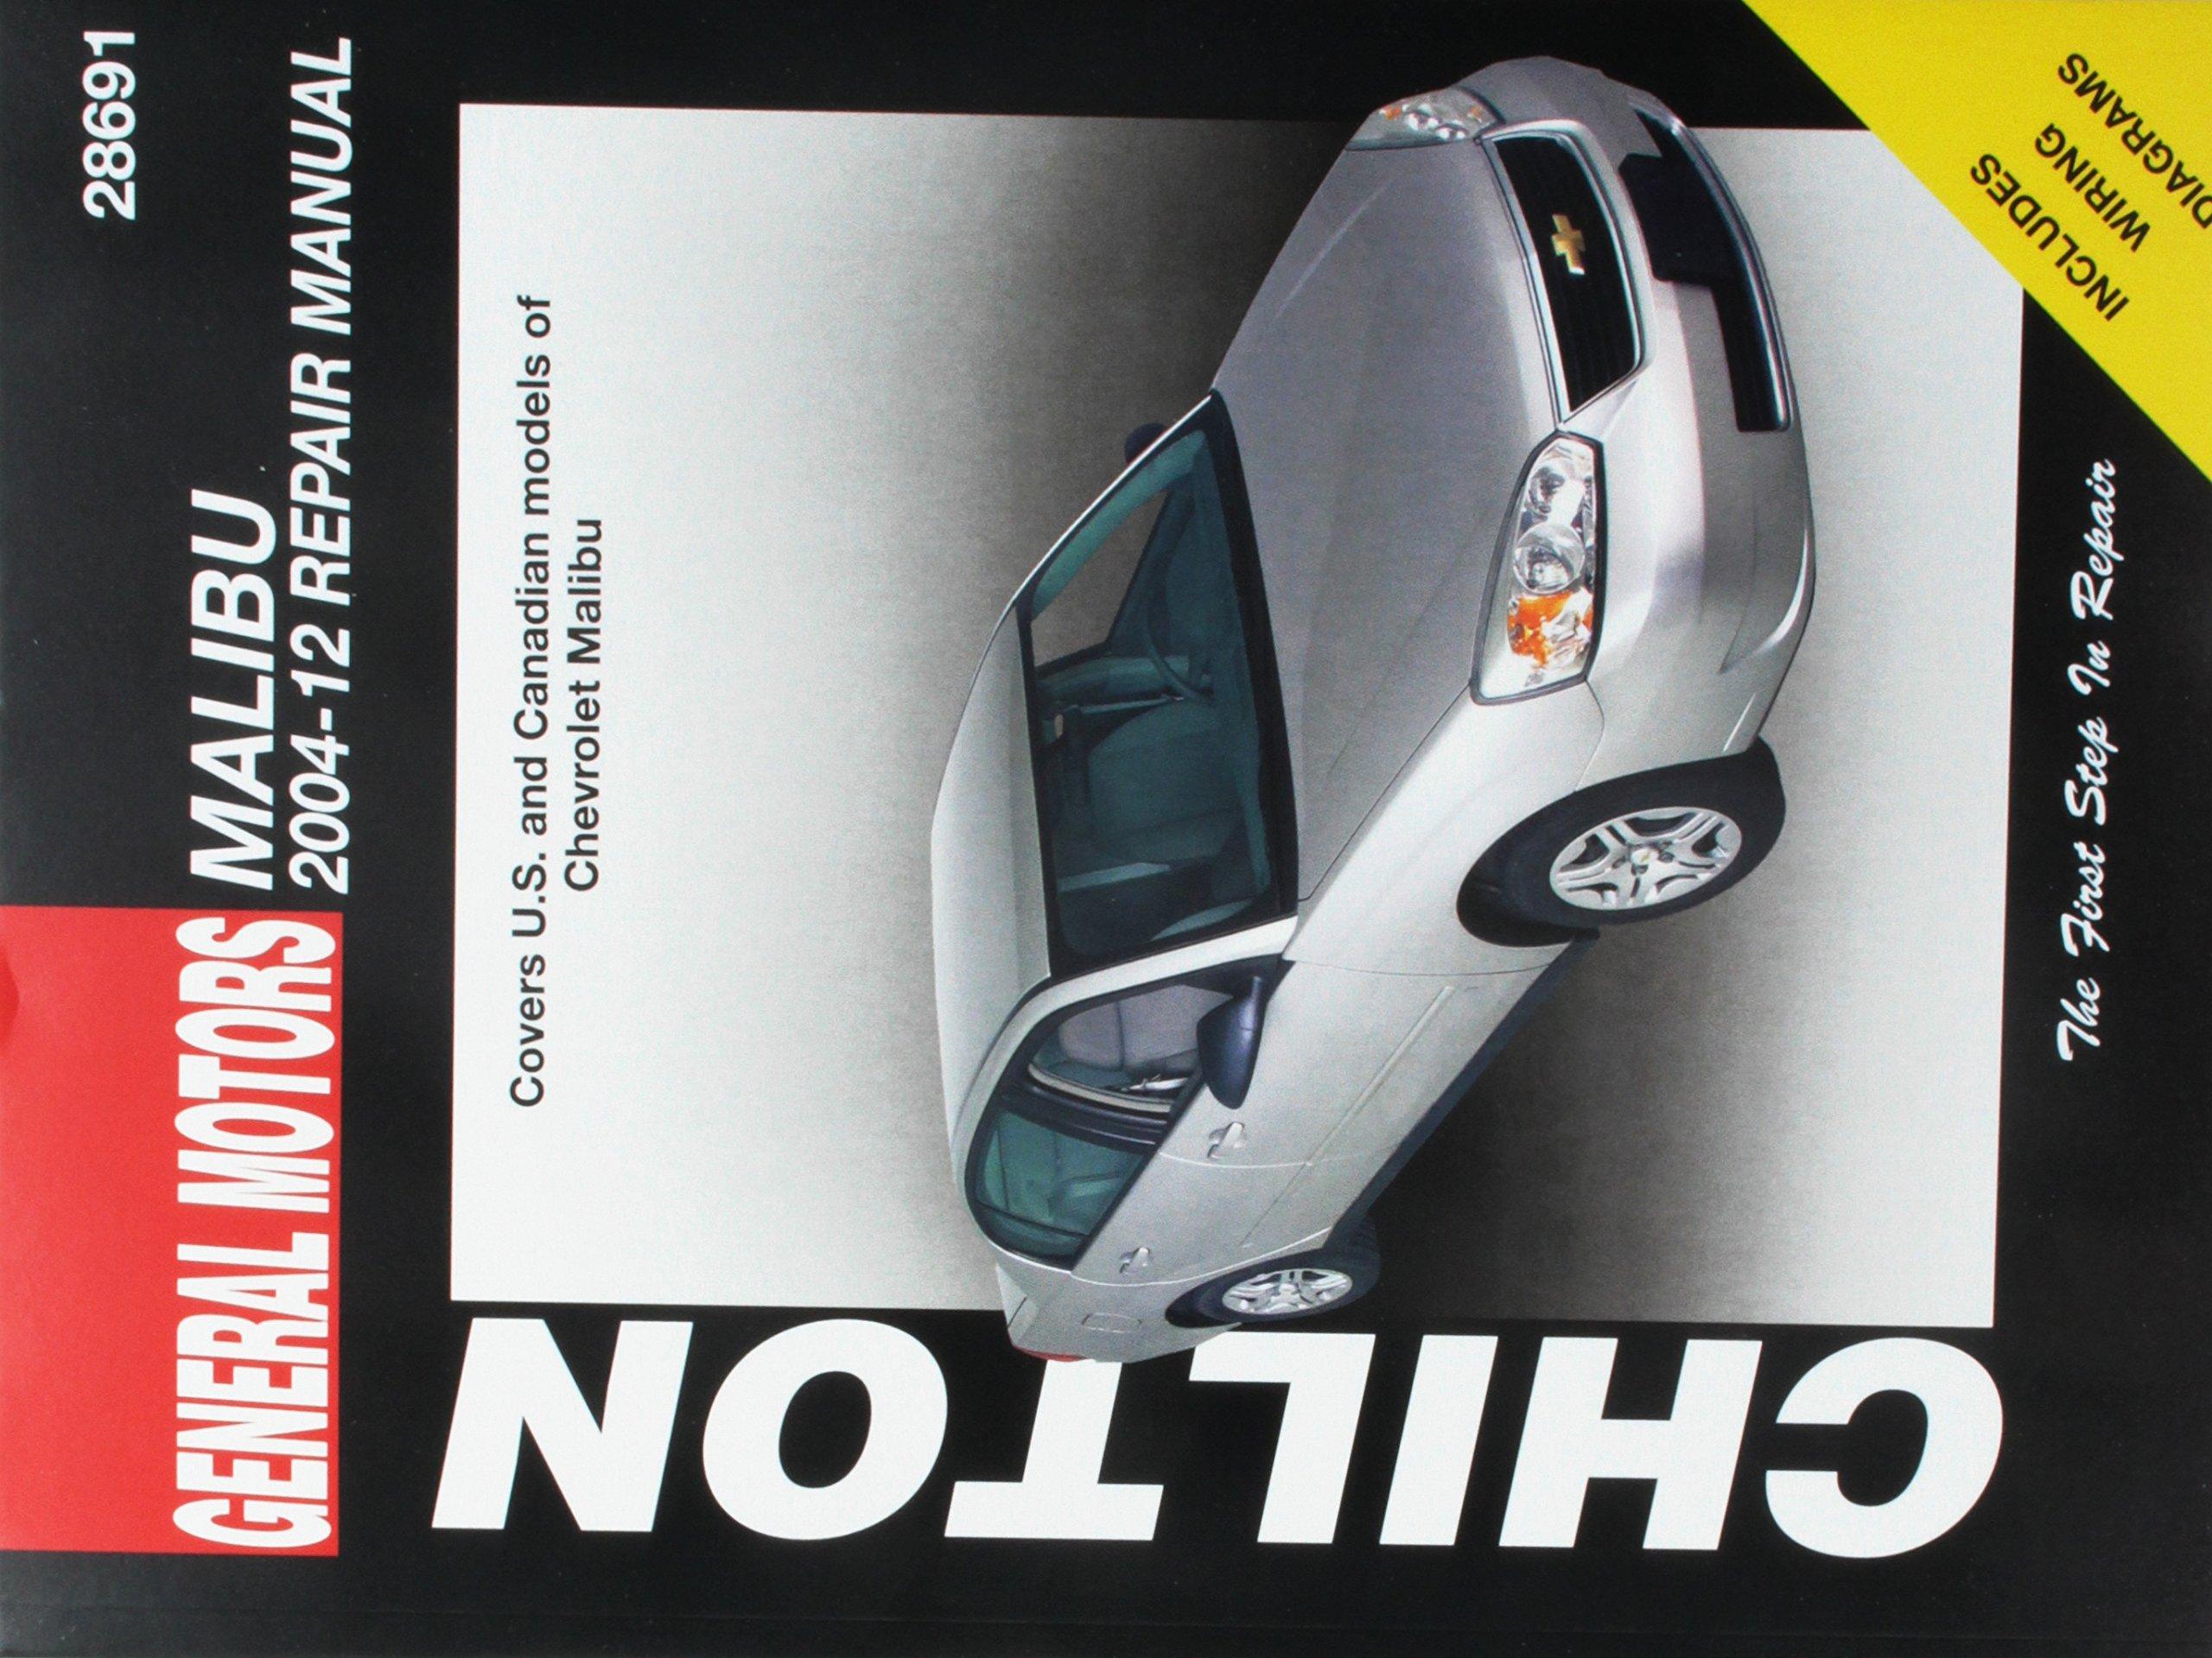 Chevrolet Malibu Automotive Repair Manual: 2004-12 (Chilton ... on